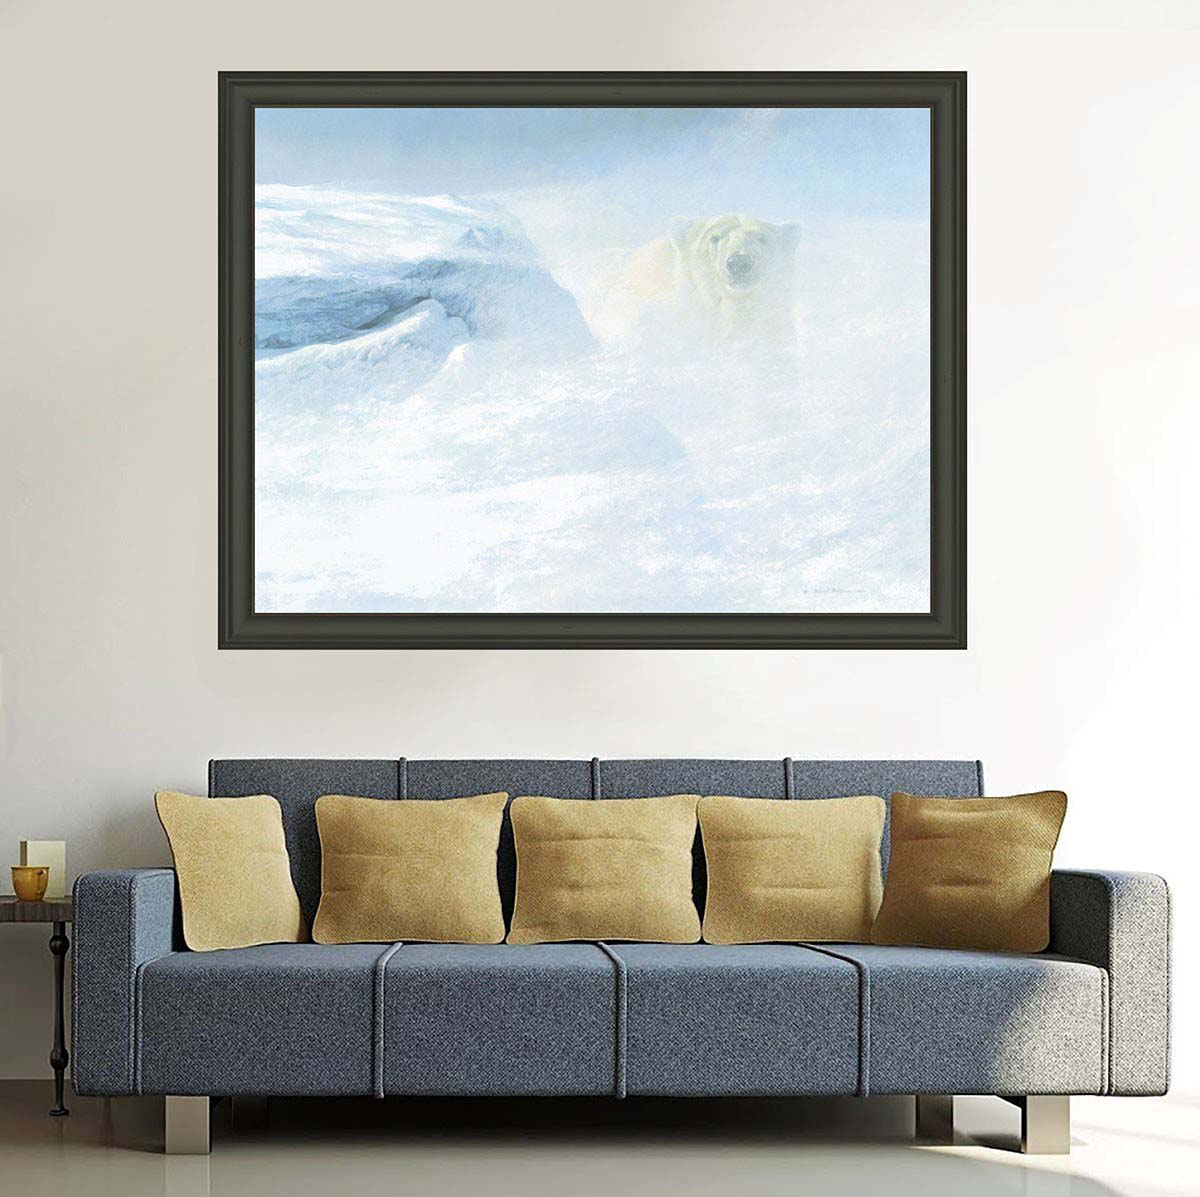 White Encounter - Polar Bear - Anniversary Edition - Robert Bateman